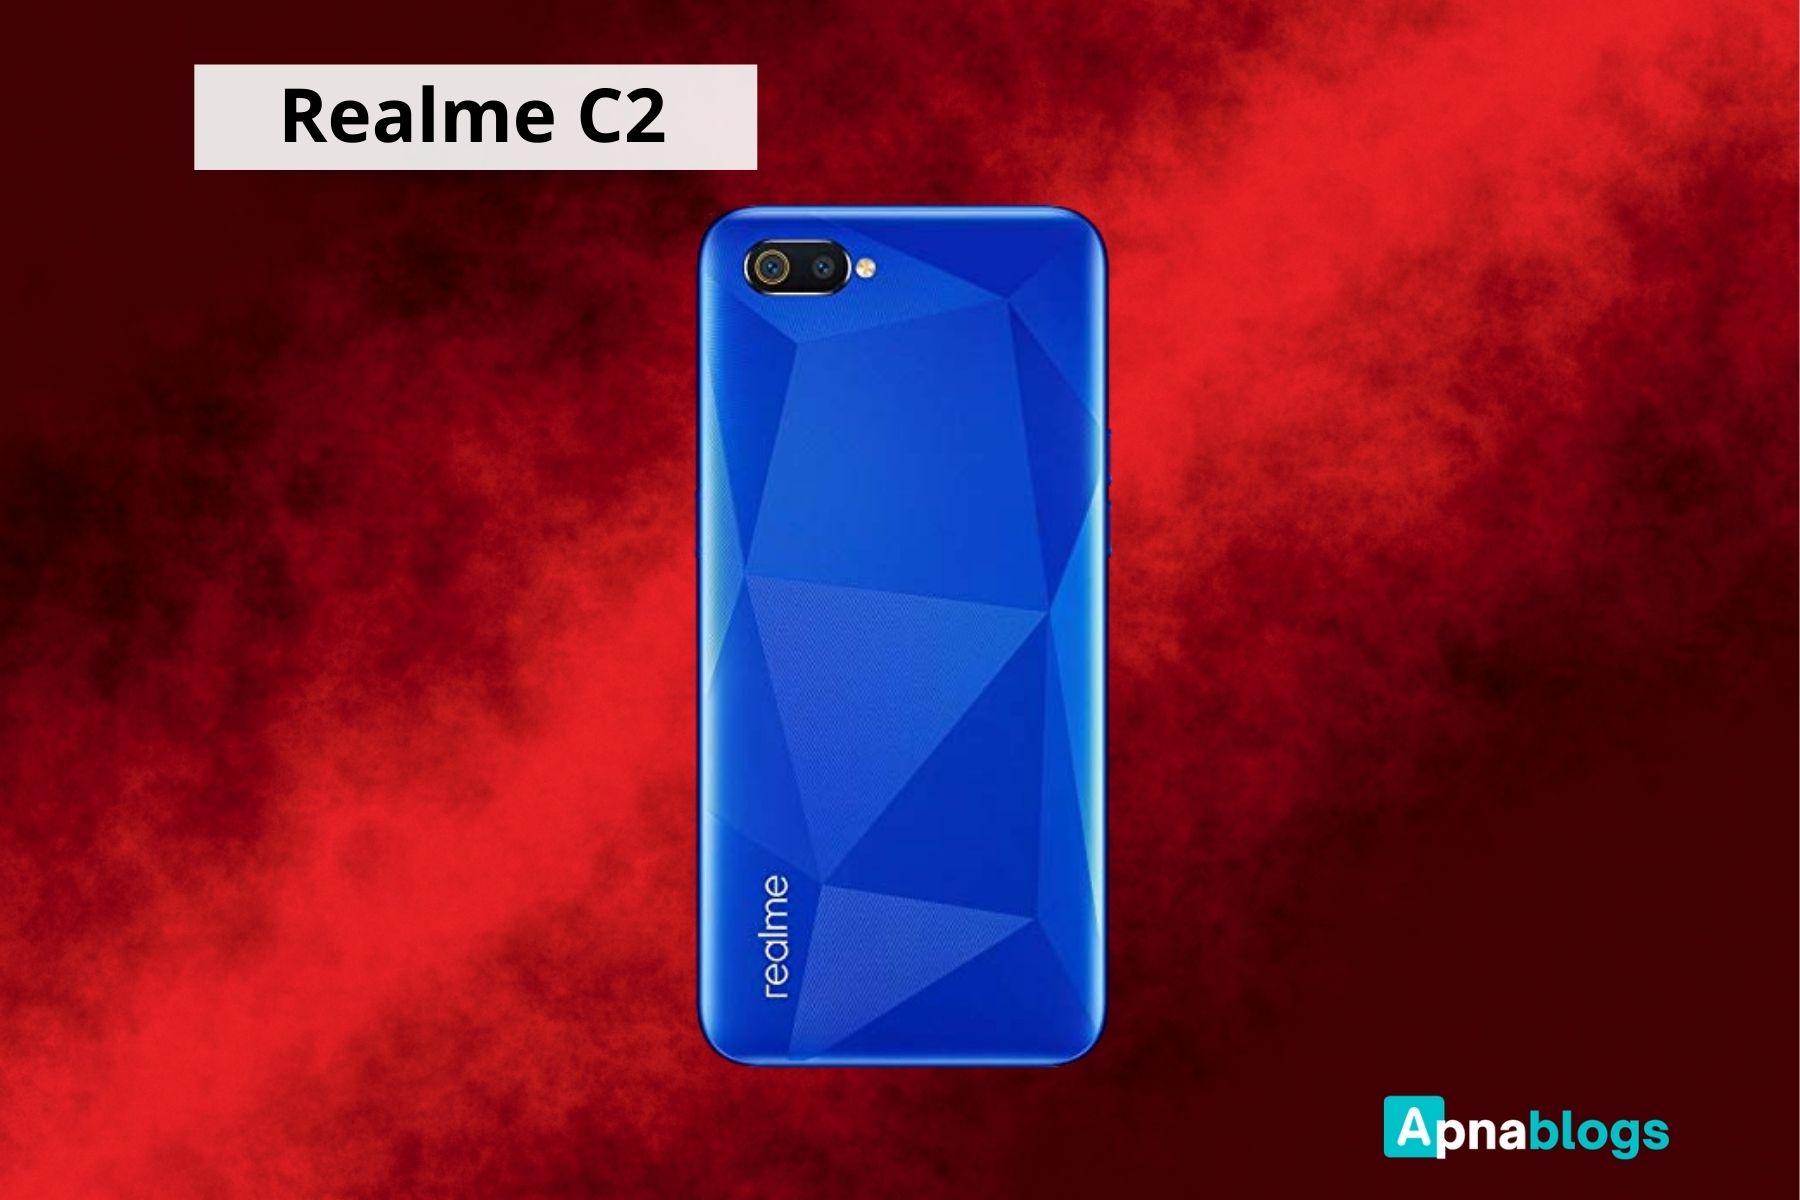 Realme C2